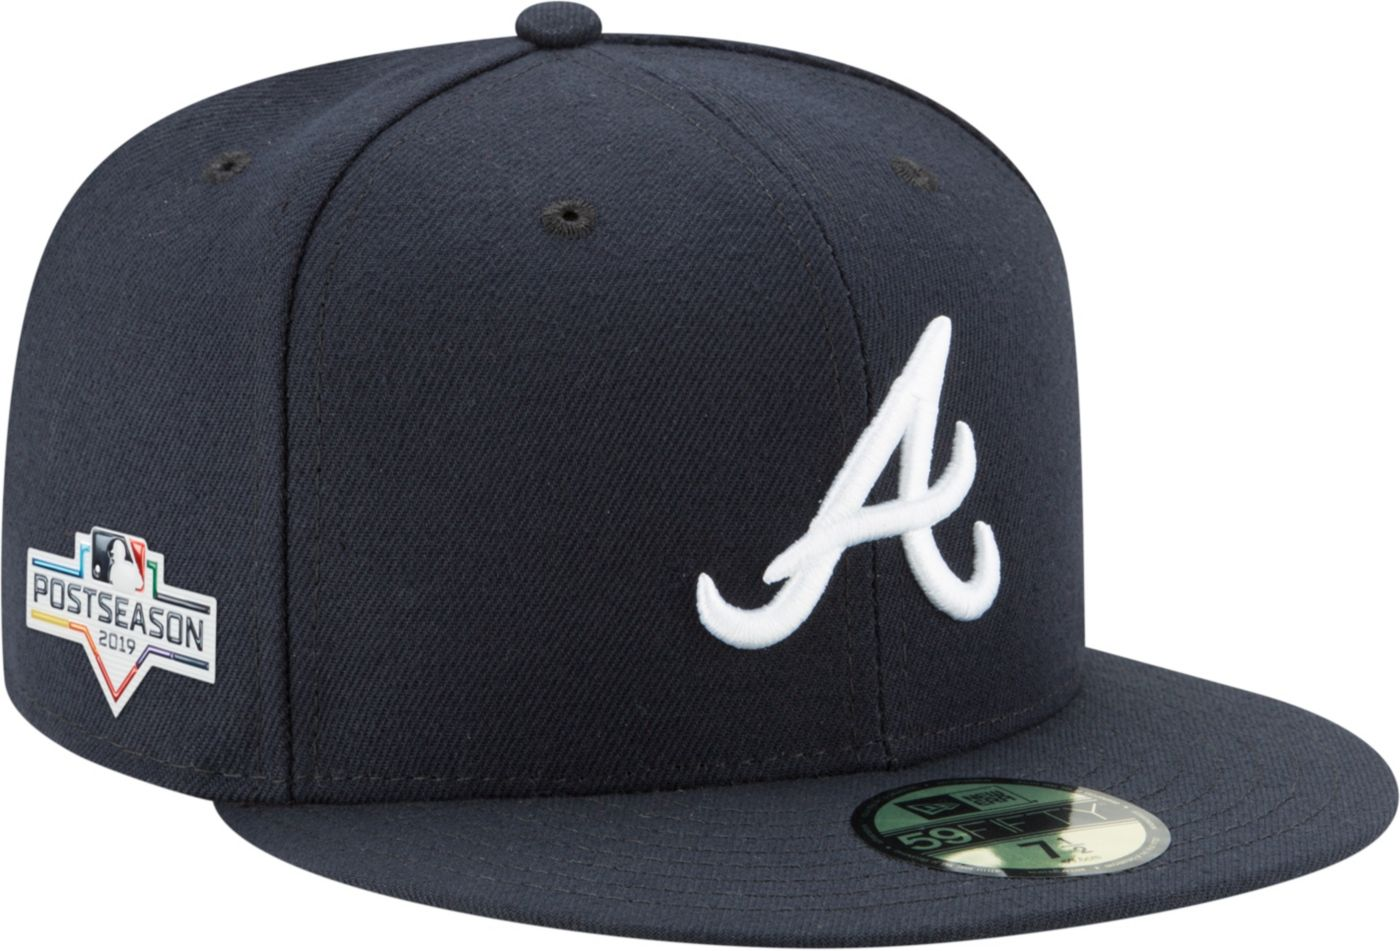 New Era Men's Atlanta Braves 59Fifty 2019 MLB Postseason Authentic Hat